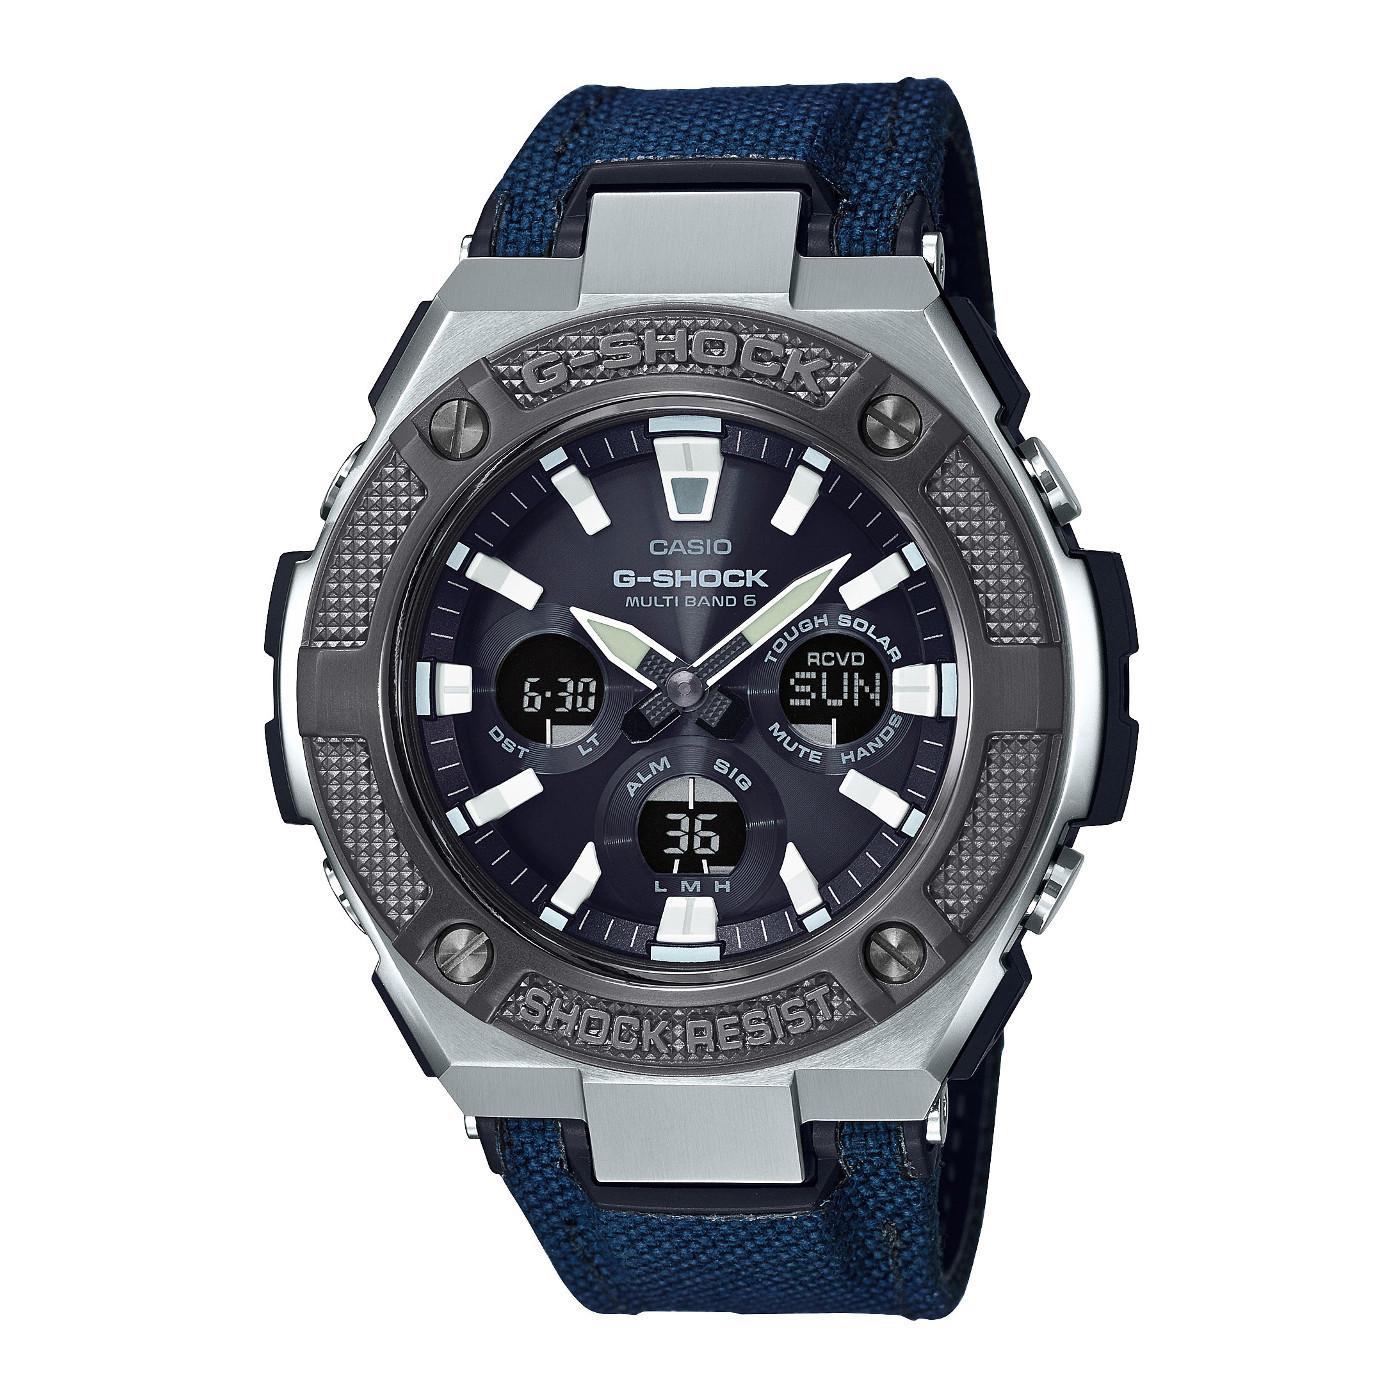 G-Shock G-Steel horloge GST-W330AC-2AER